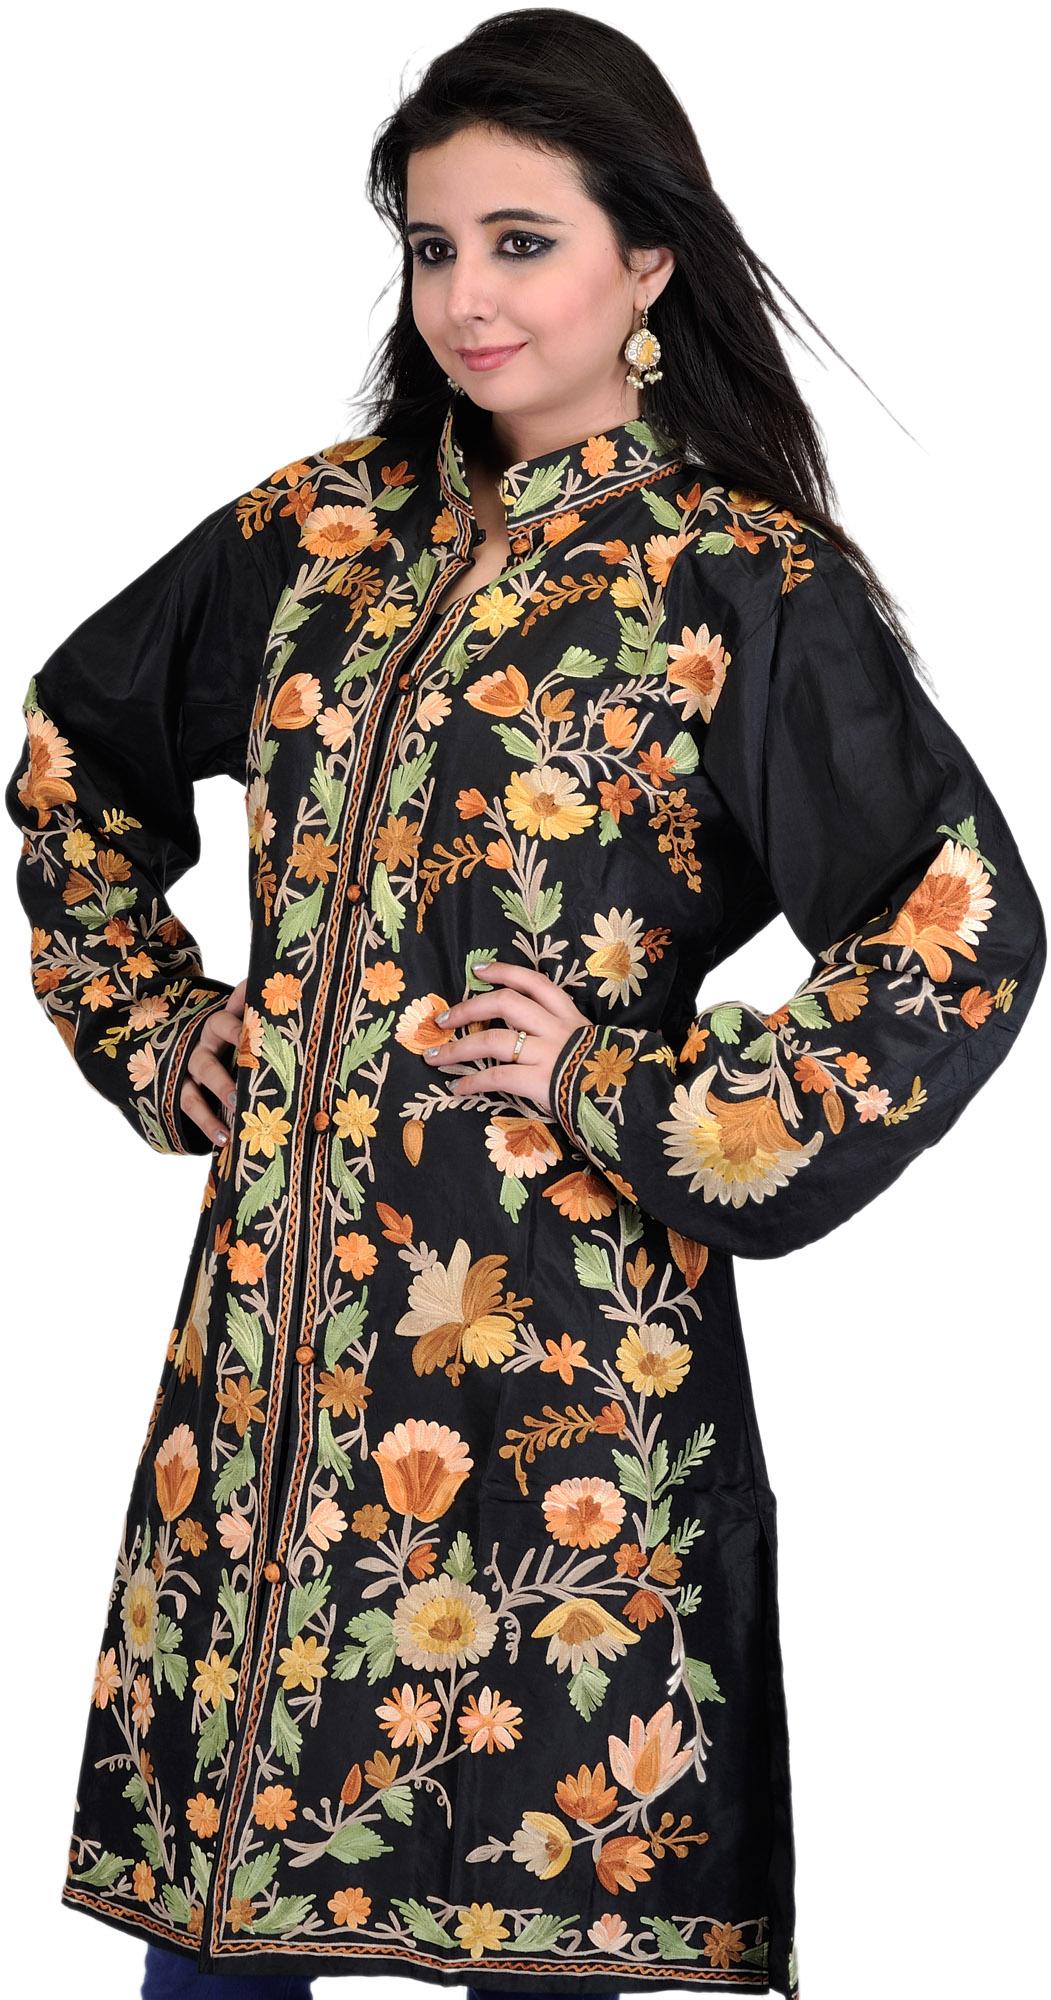 Black Long Kashmiri Jacket With Ari Embroidered Flowers